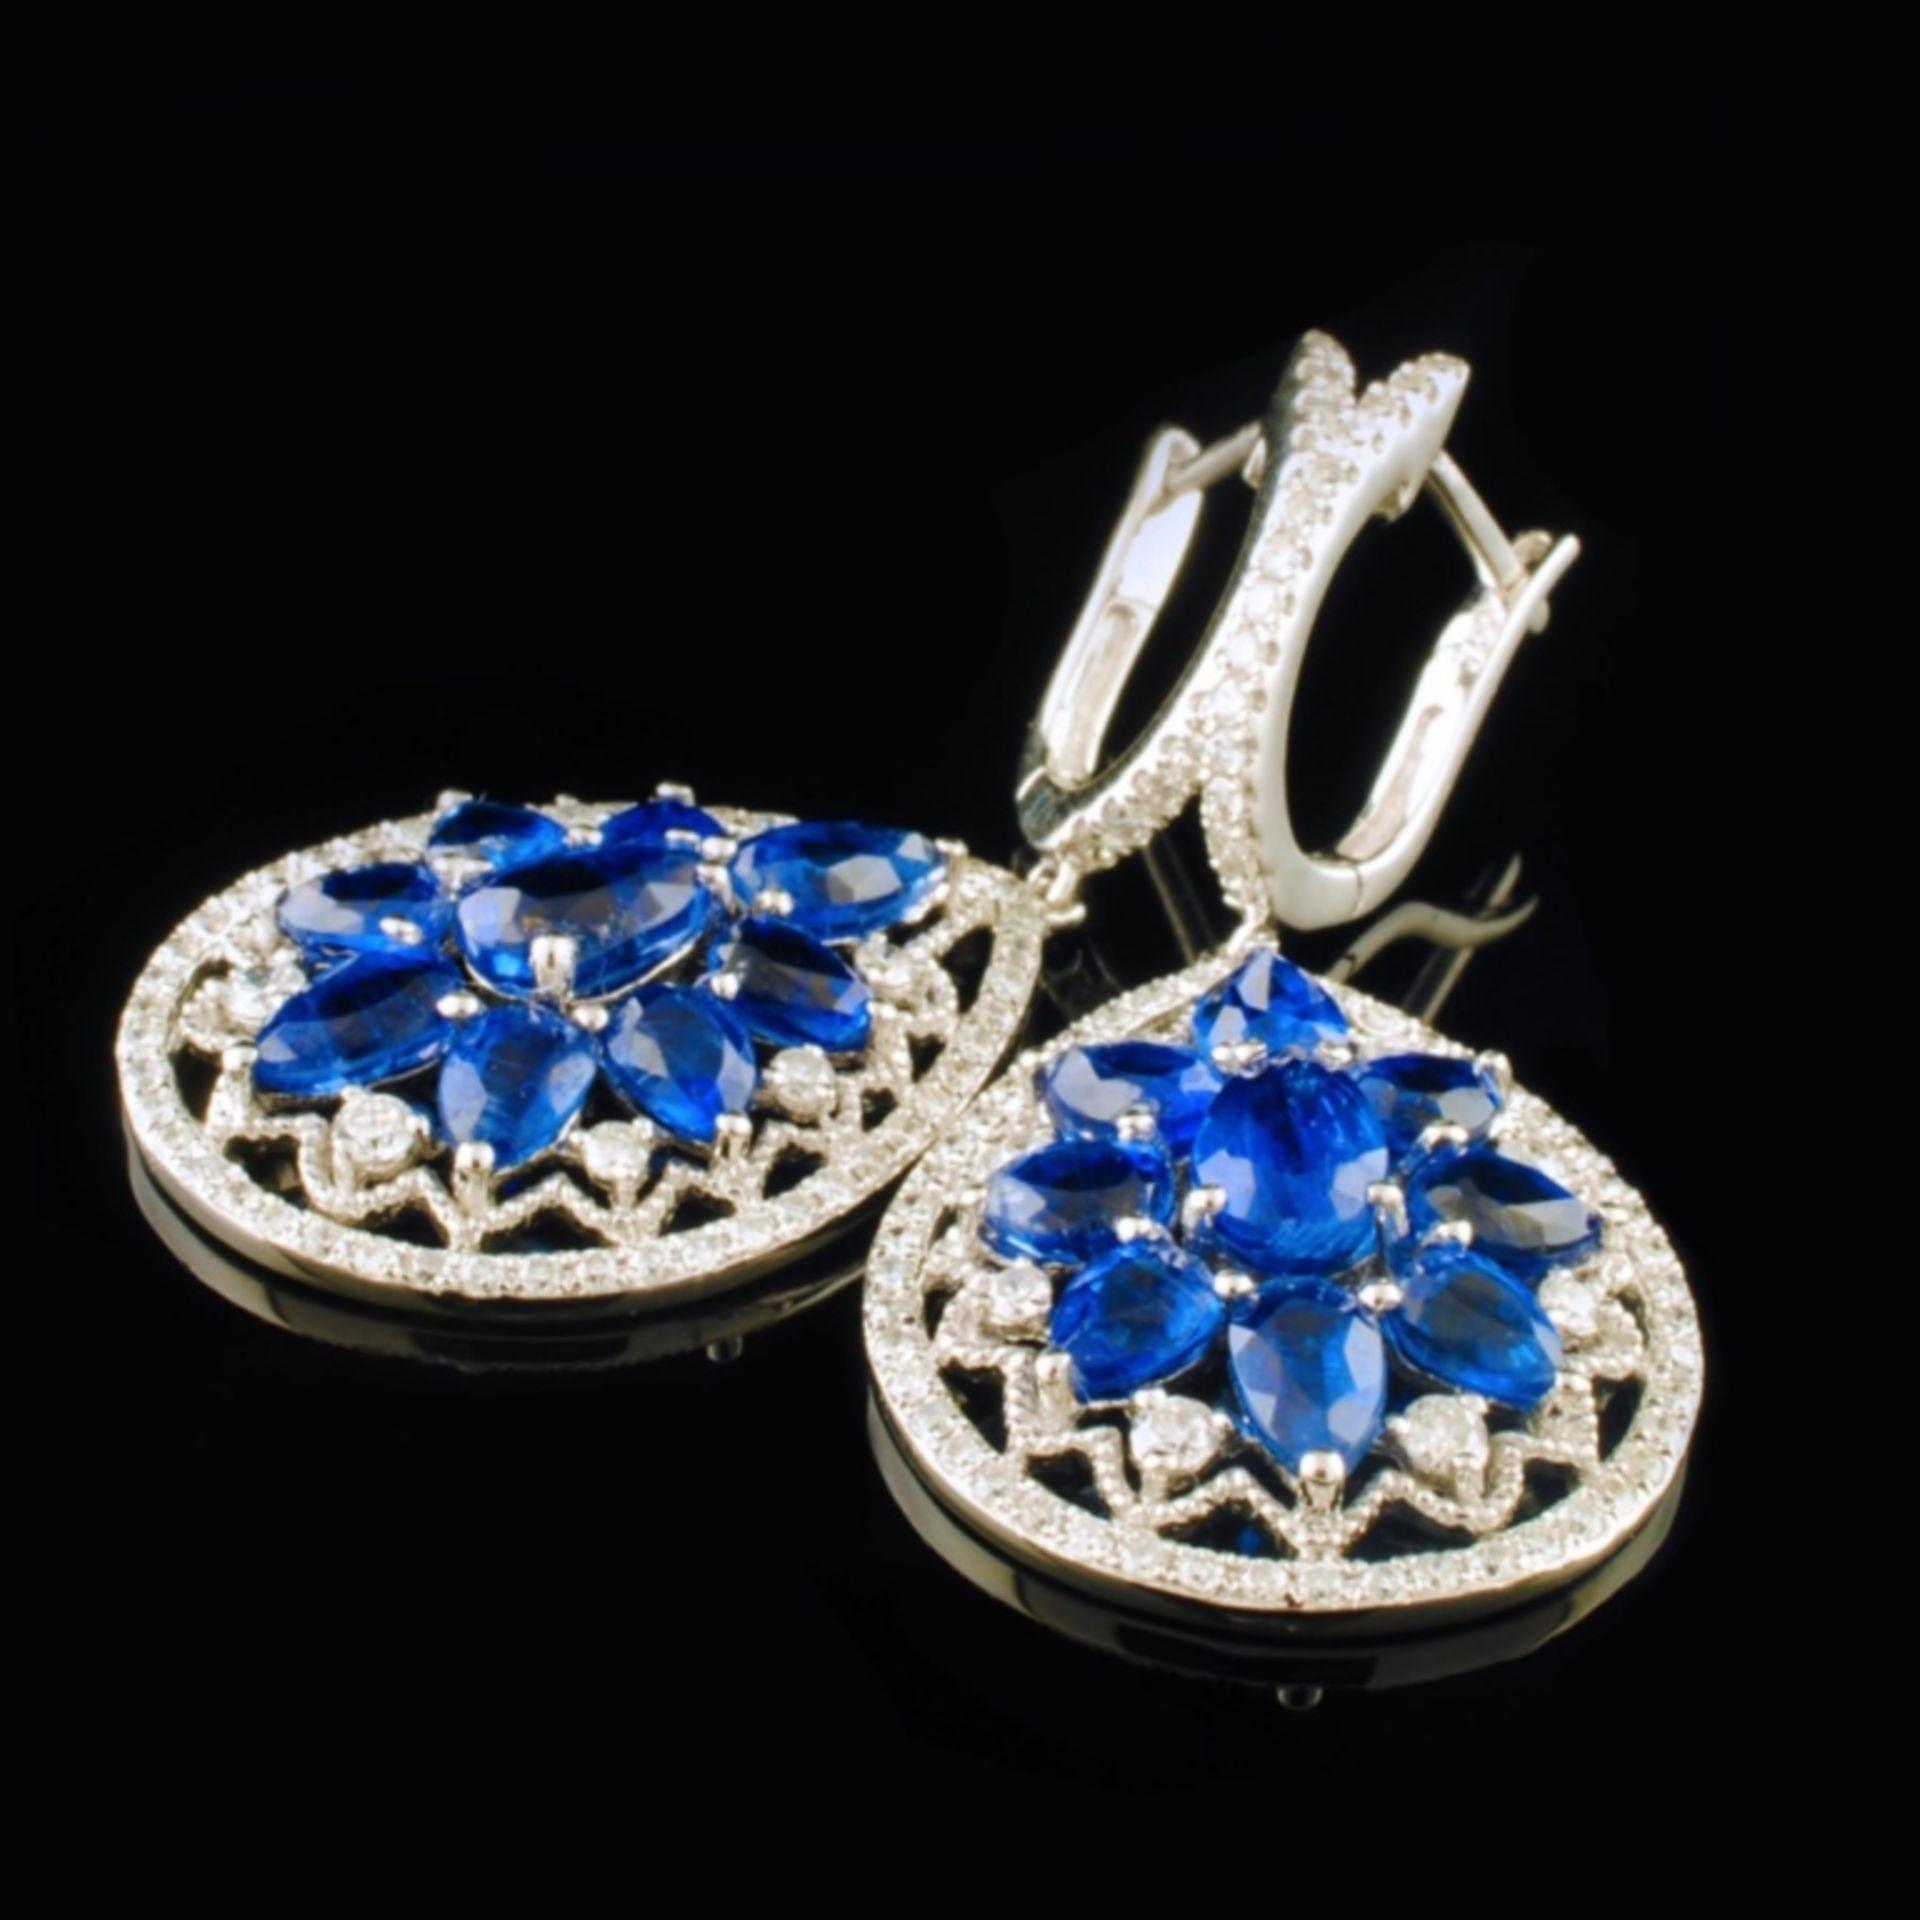 18K White Gold 5.13ct Kyanite & 0.76ctw Diamond Ea